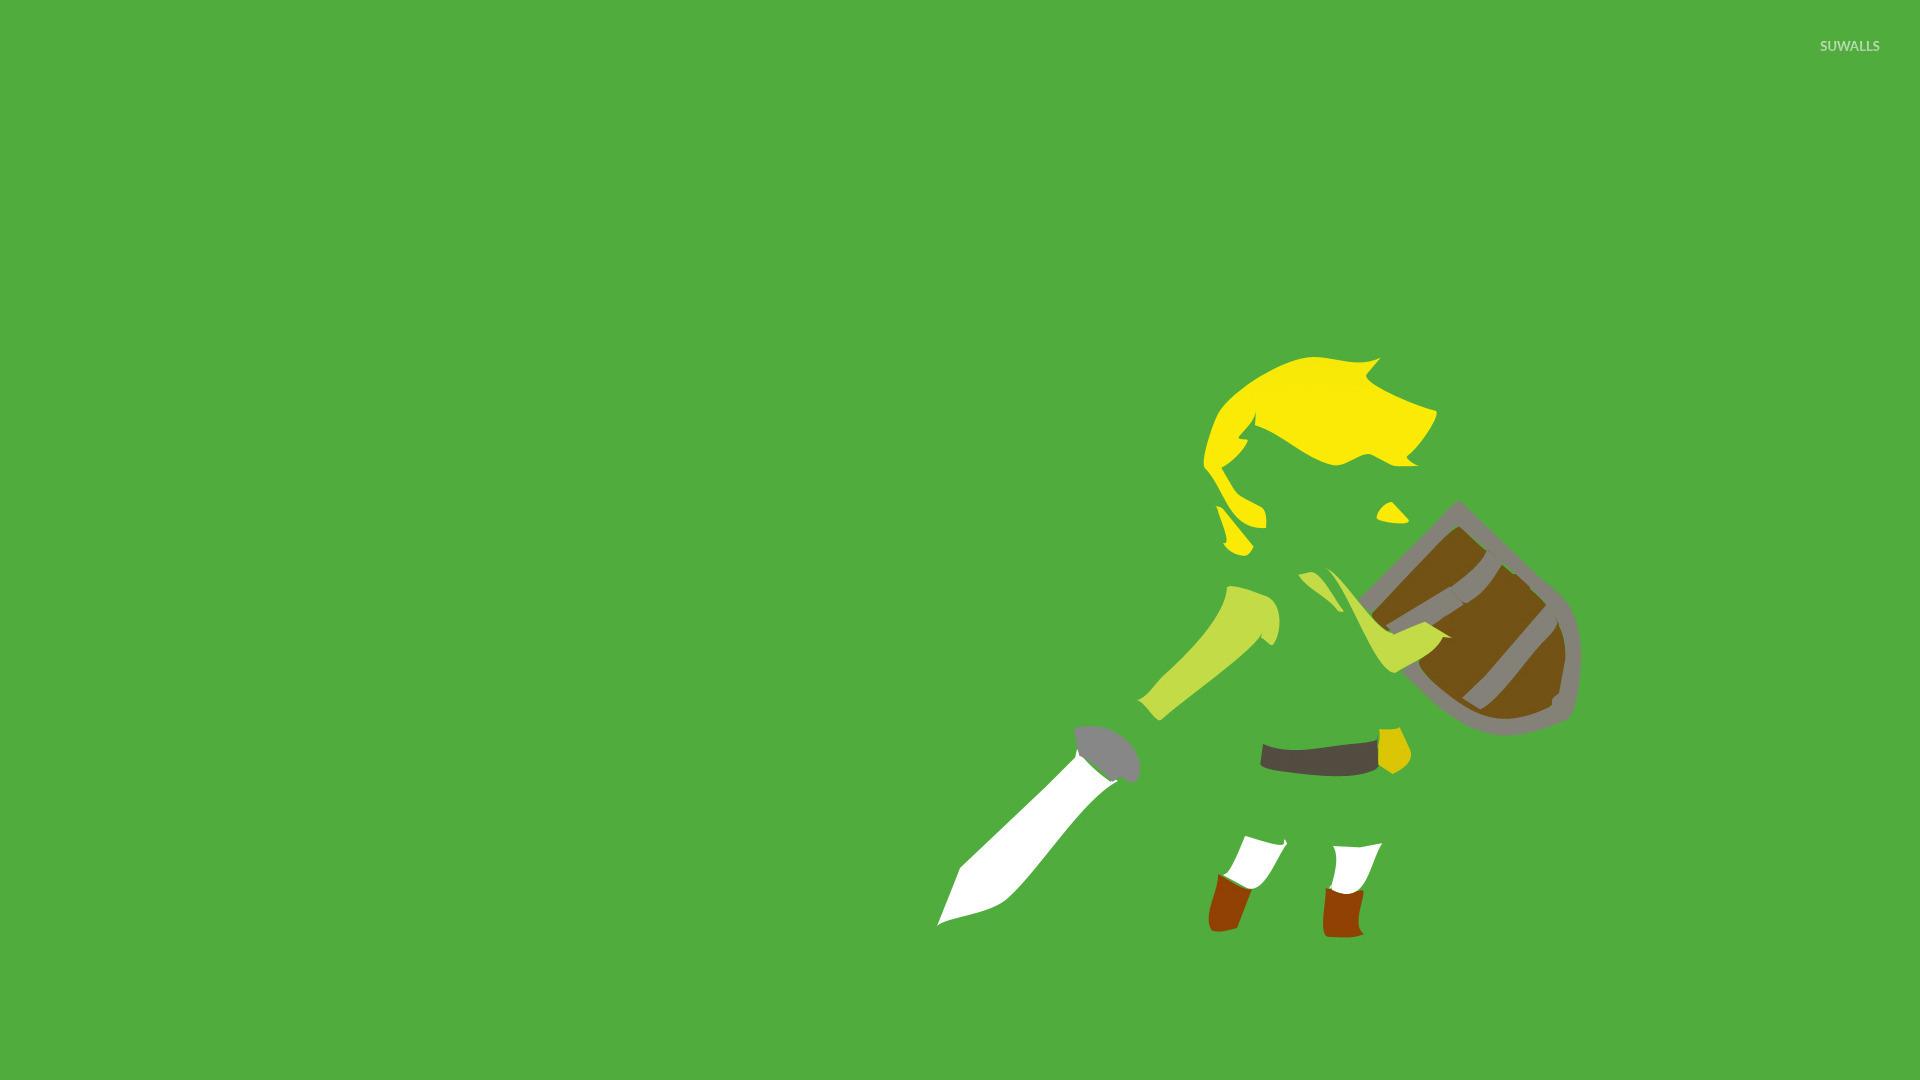 Free Download Link The Legend Of Zelda 2 Wallpaper Game Wallpapers